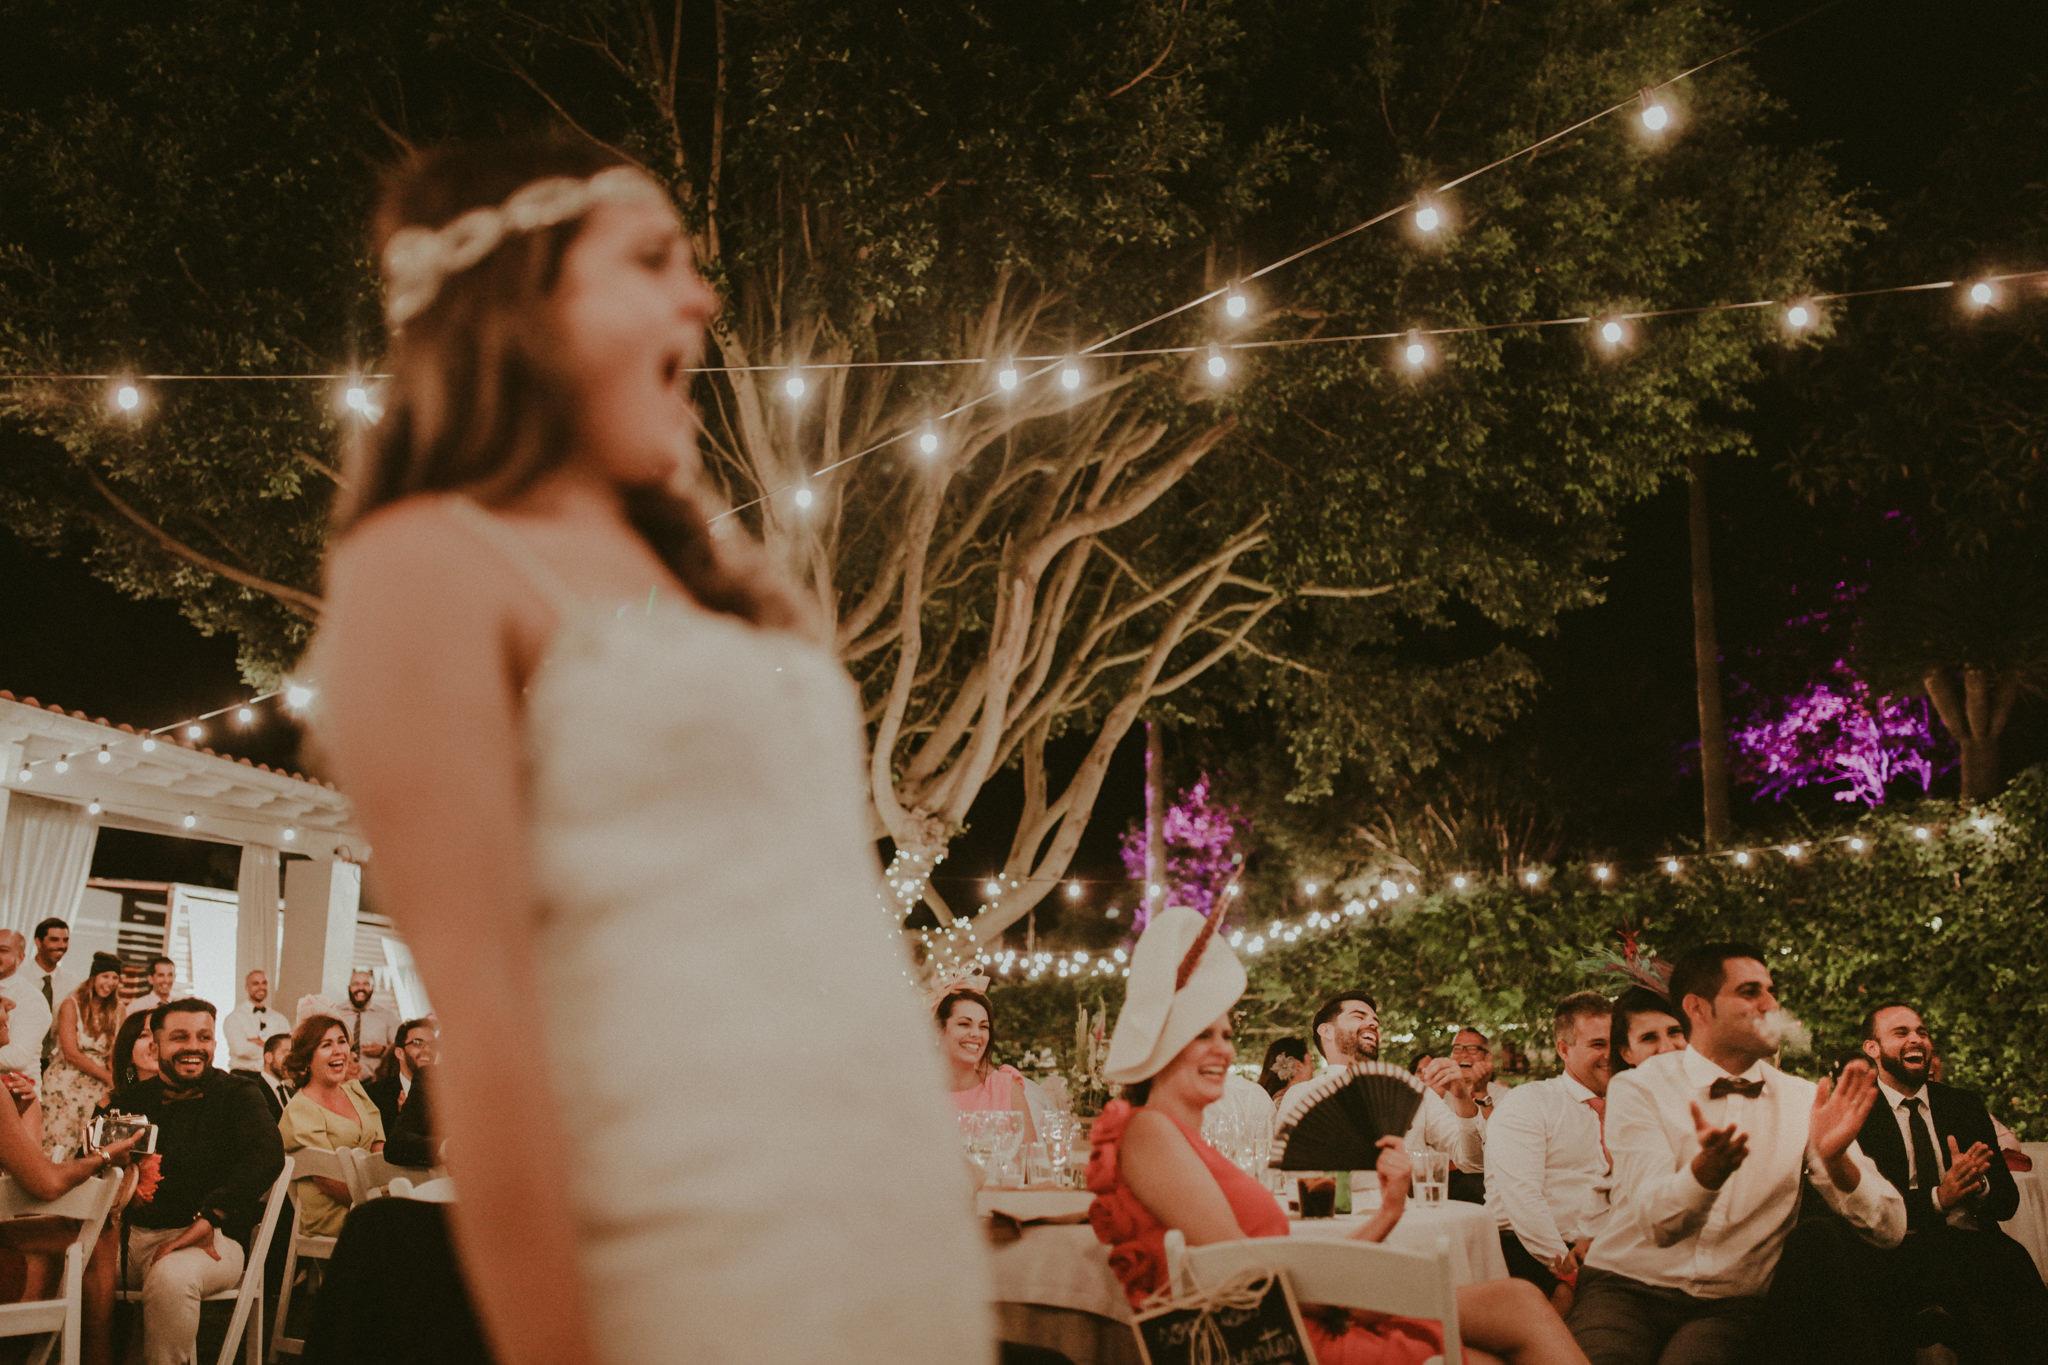 boda-diferente-fotografo-boda-laspalmas-grancanaria-89